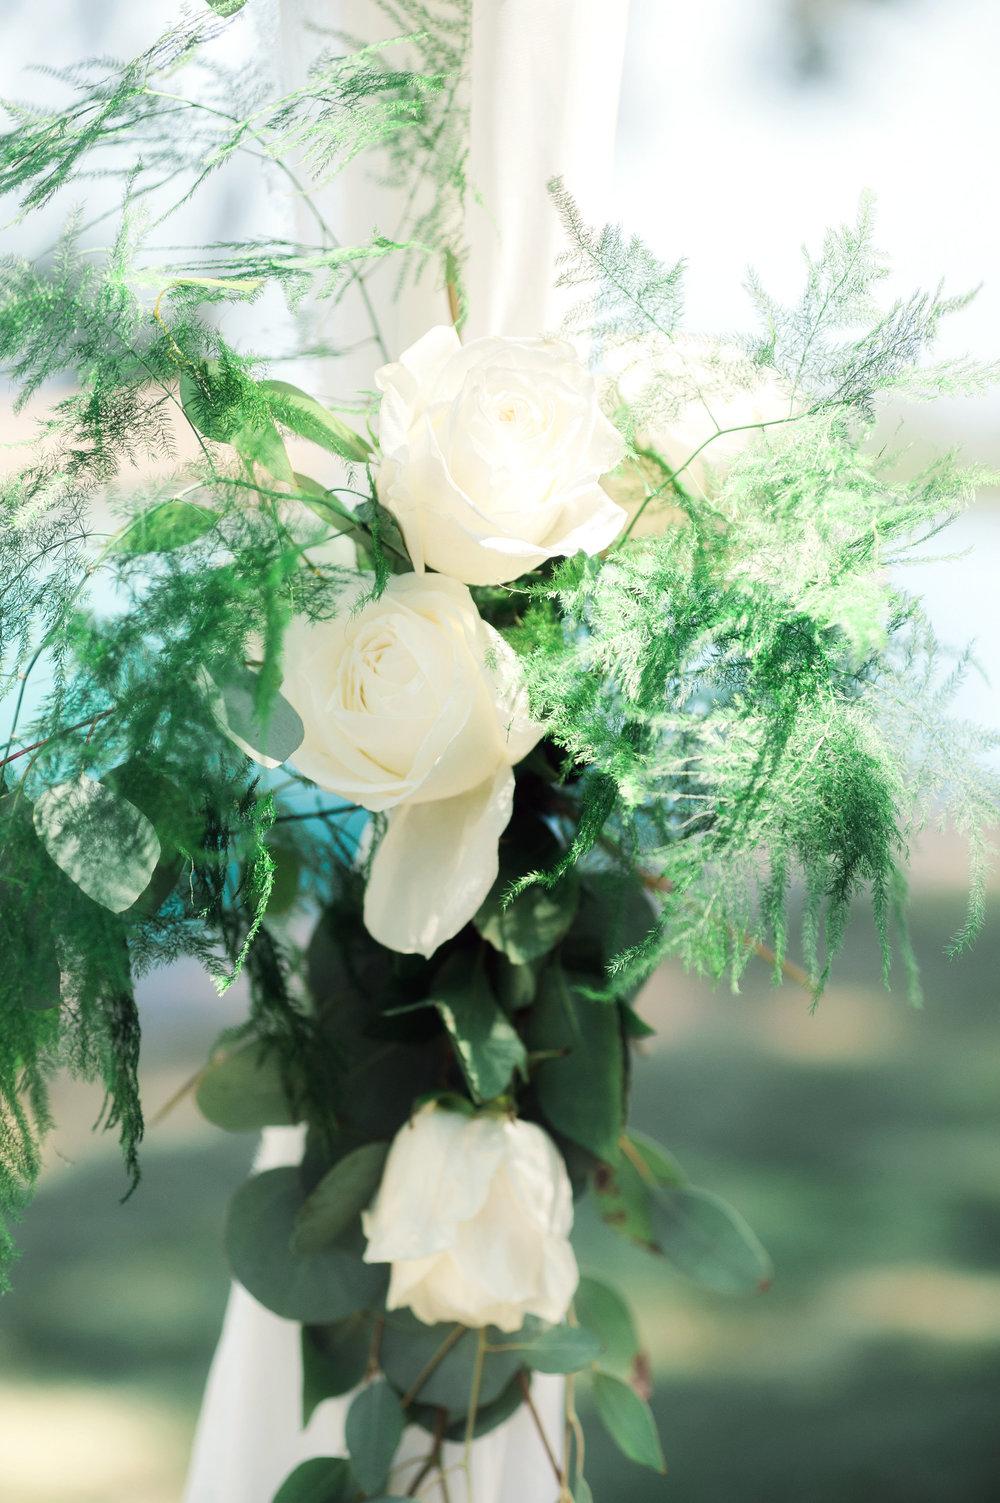 santabarbarawedding.com | Wisteria Lane Flroal Design Studio | Bride and Groom | White Roses